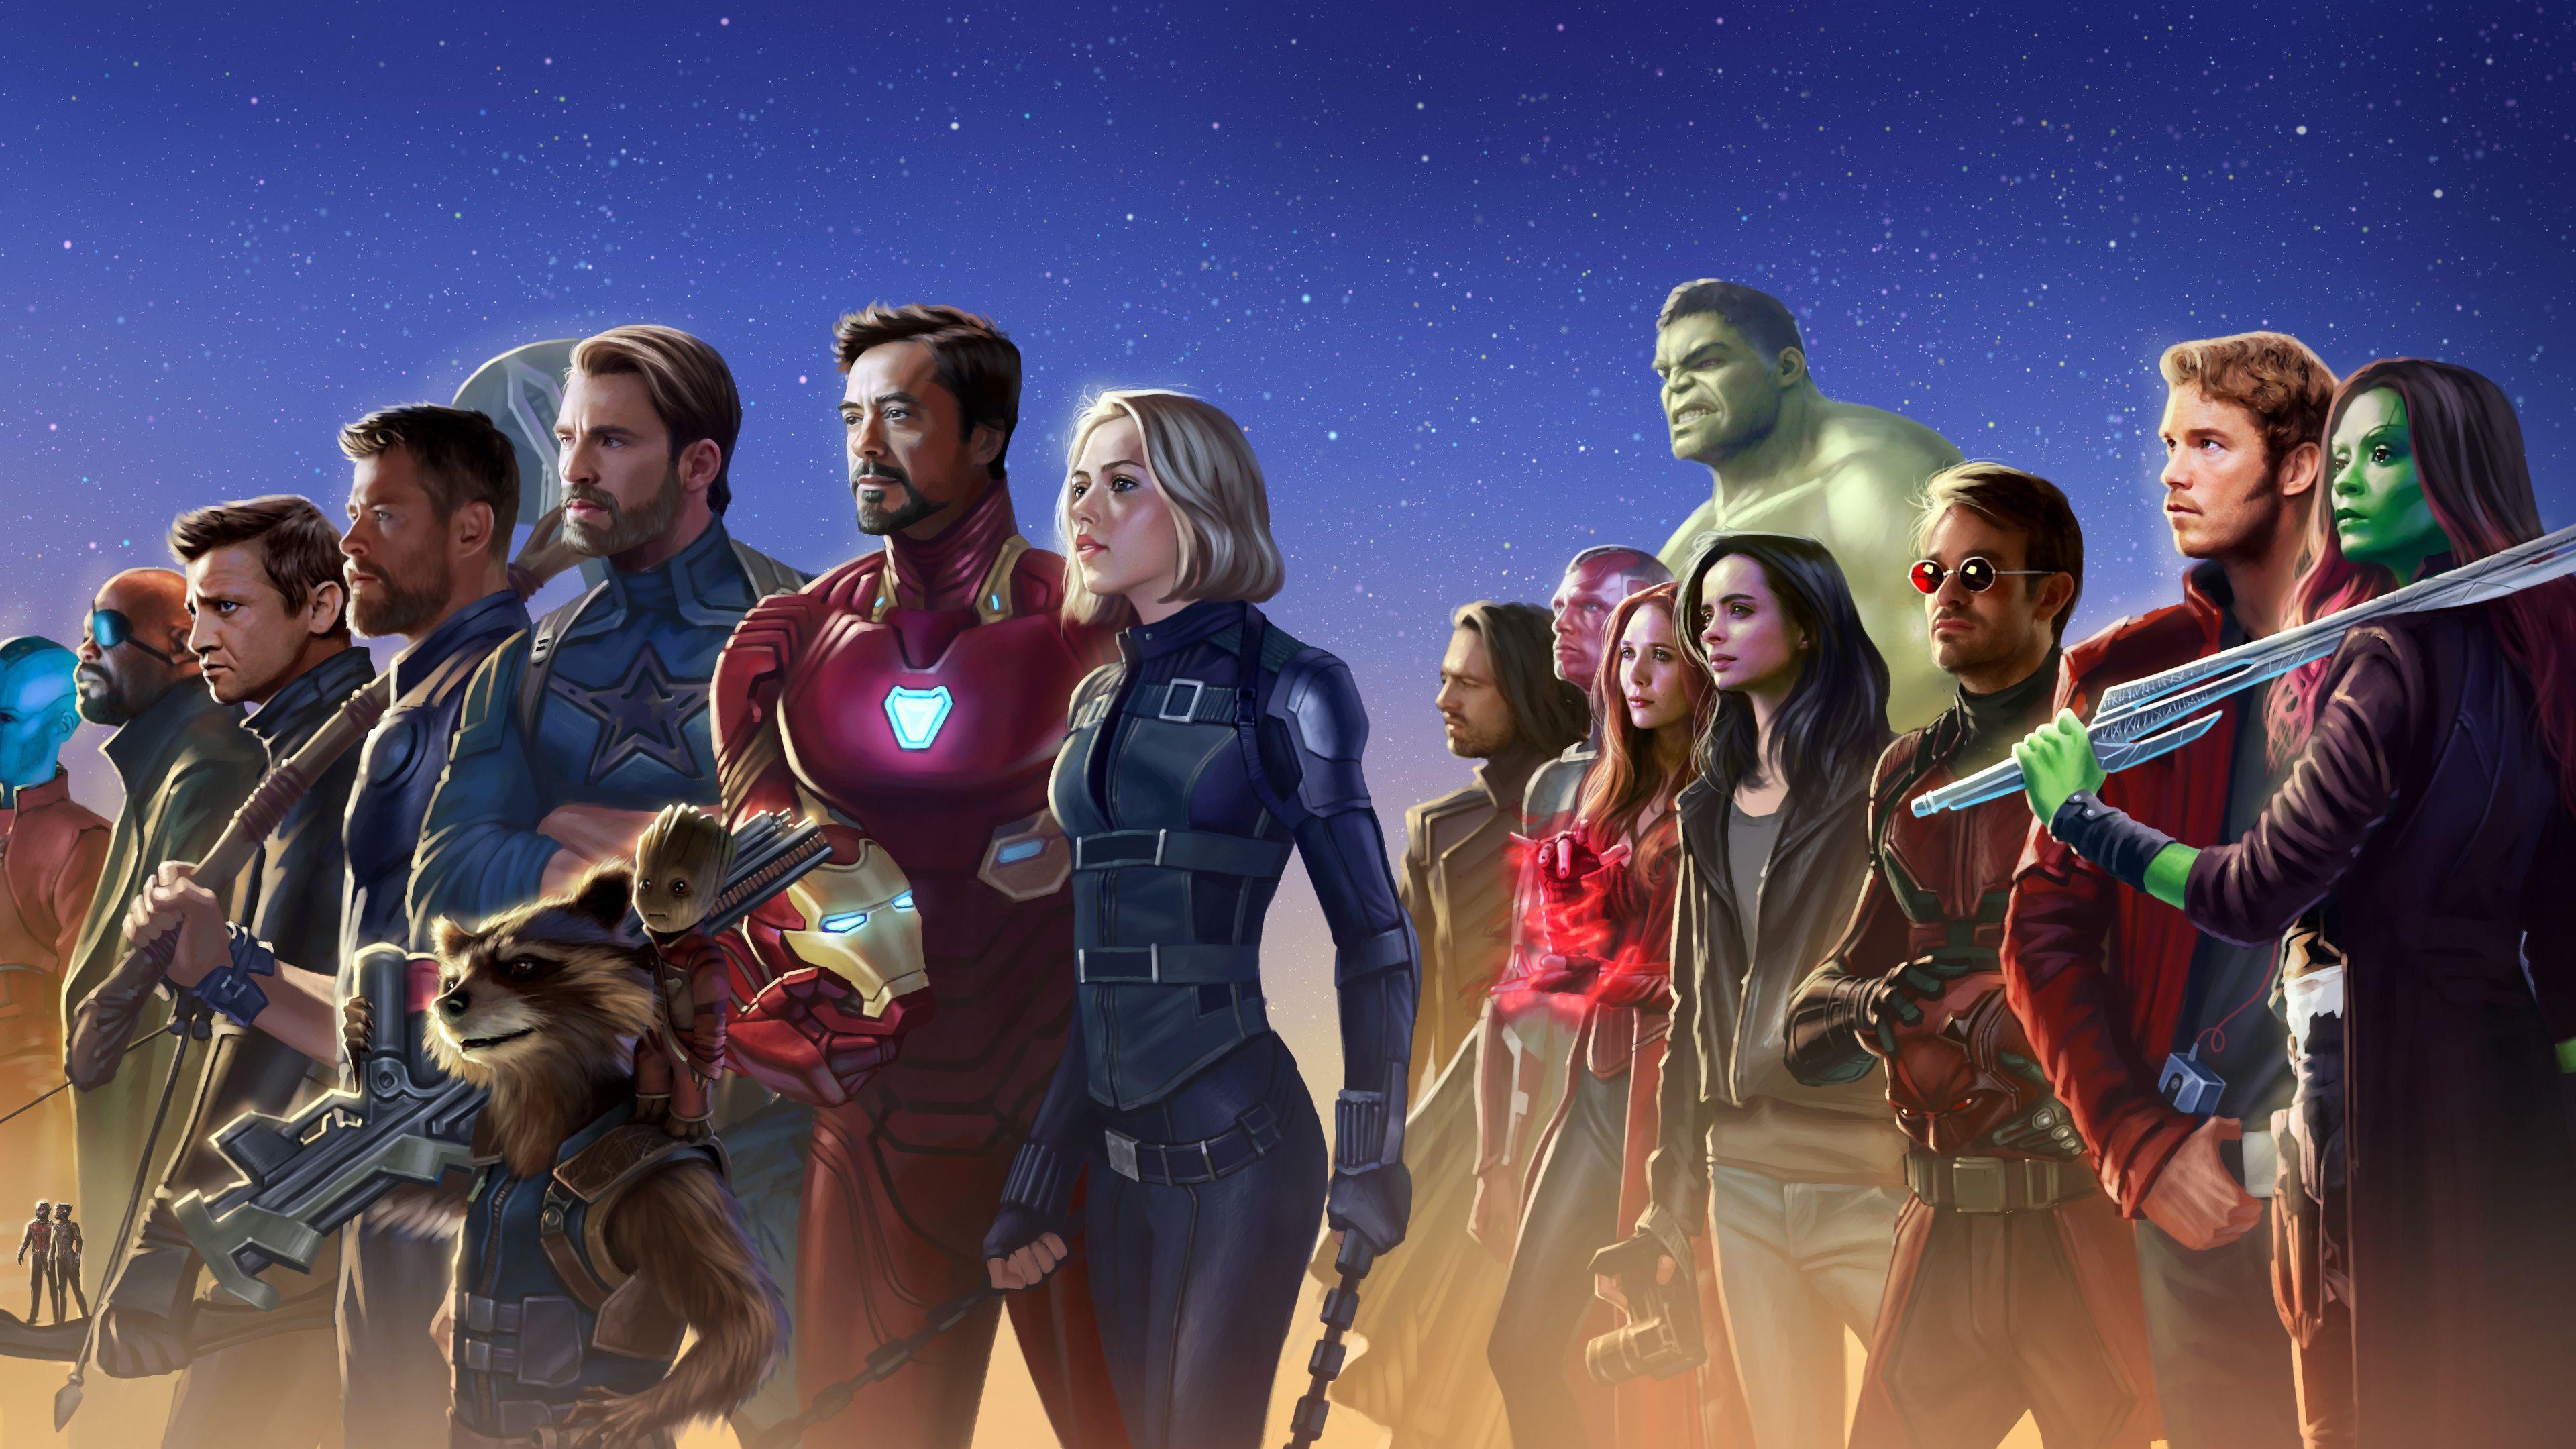 Avengers Infinity War 4k 5k Movies Wallpapers Hd Wallpapers Deviantart Wallpapers Avengers Infinity War Marvel Superheroes Marvel Avengers Marvel Wallpaper